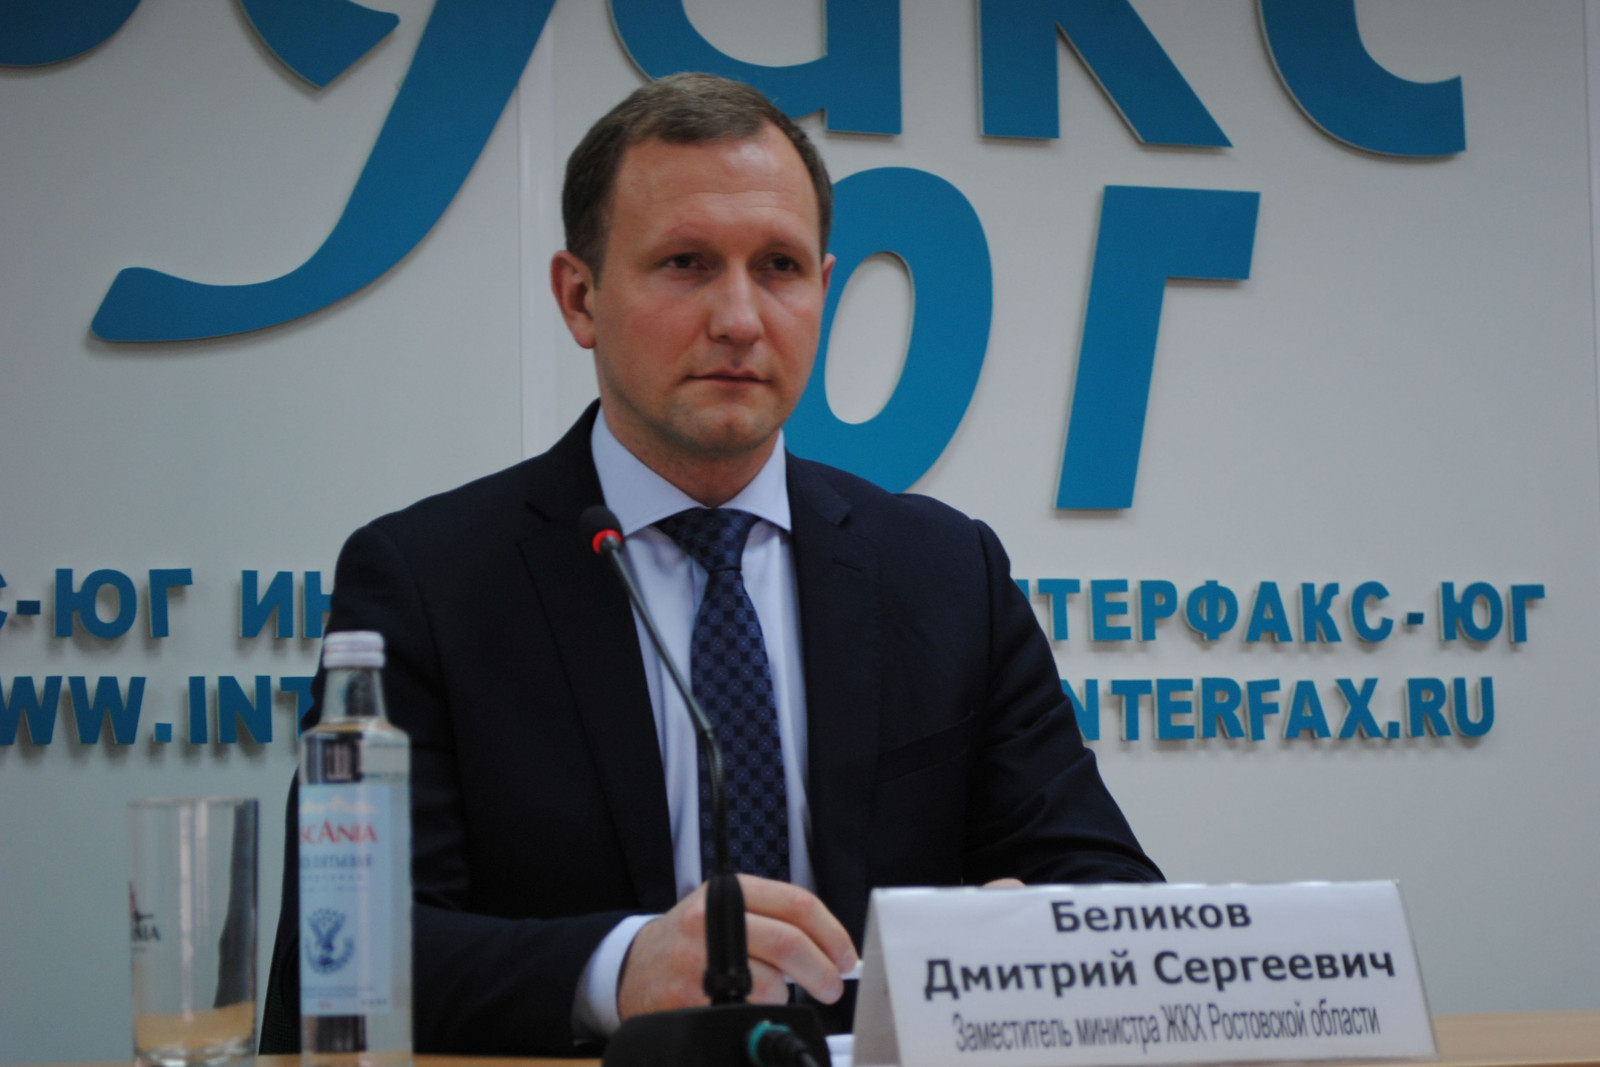 1,4 млрд рублей направят на благоустройство парков и скверов